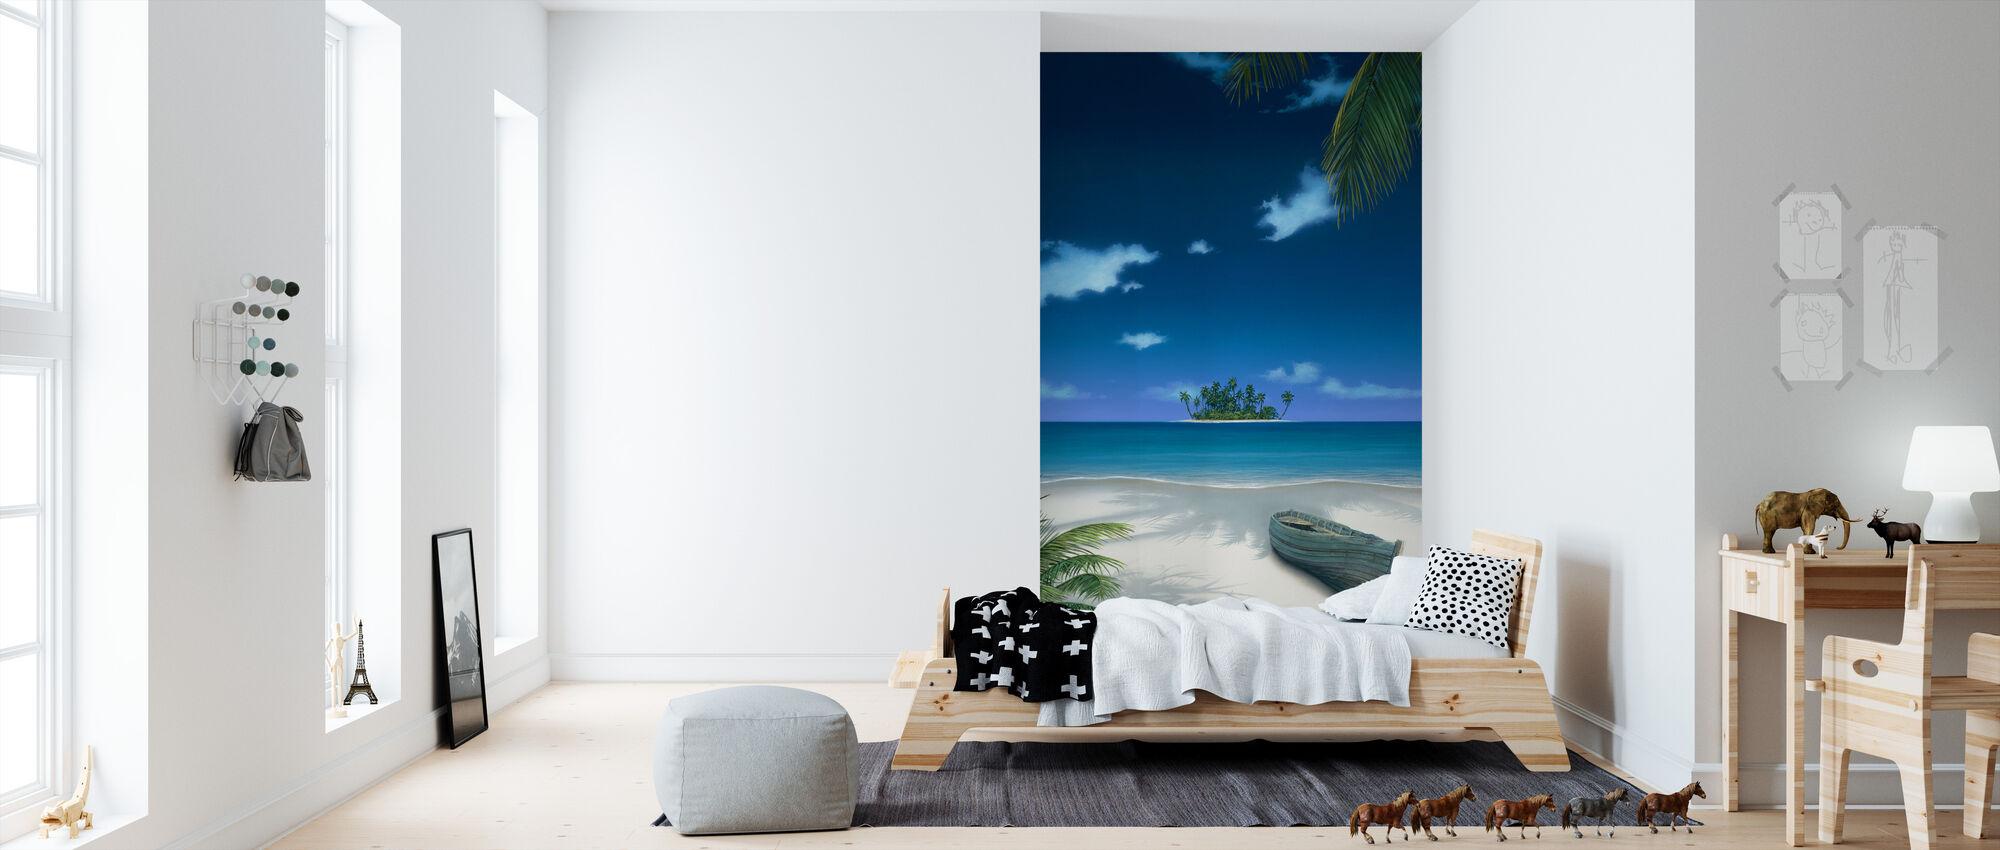 beached fototapete nach ma photowall. Black Bedroom Furniture Sets. Home Design Ideas